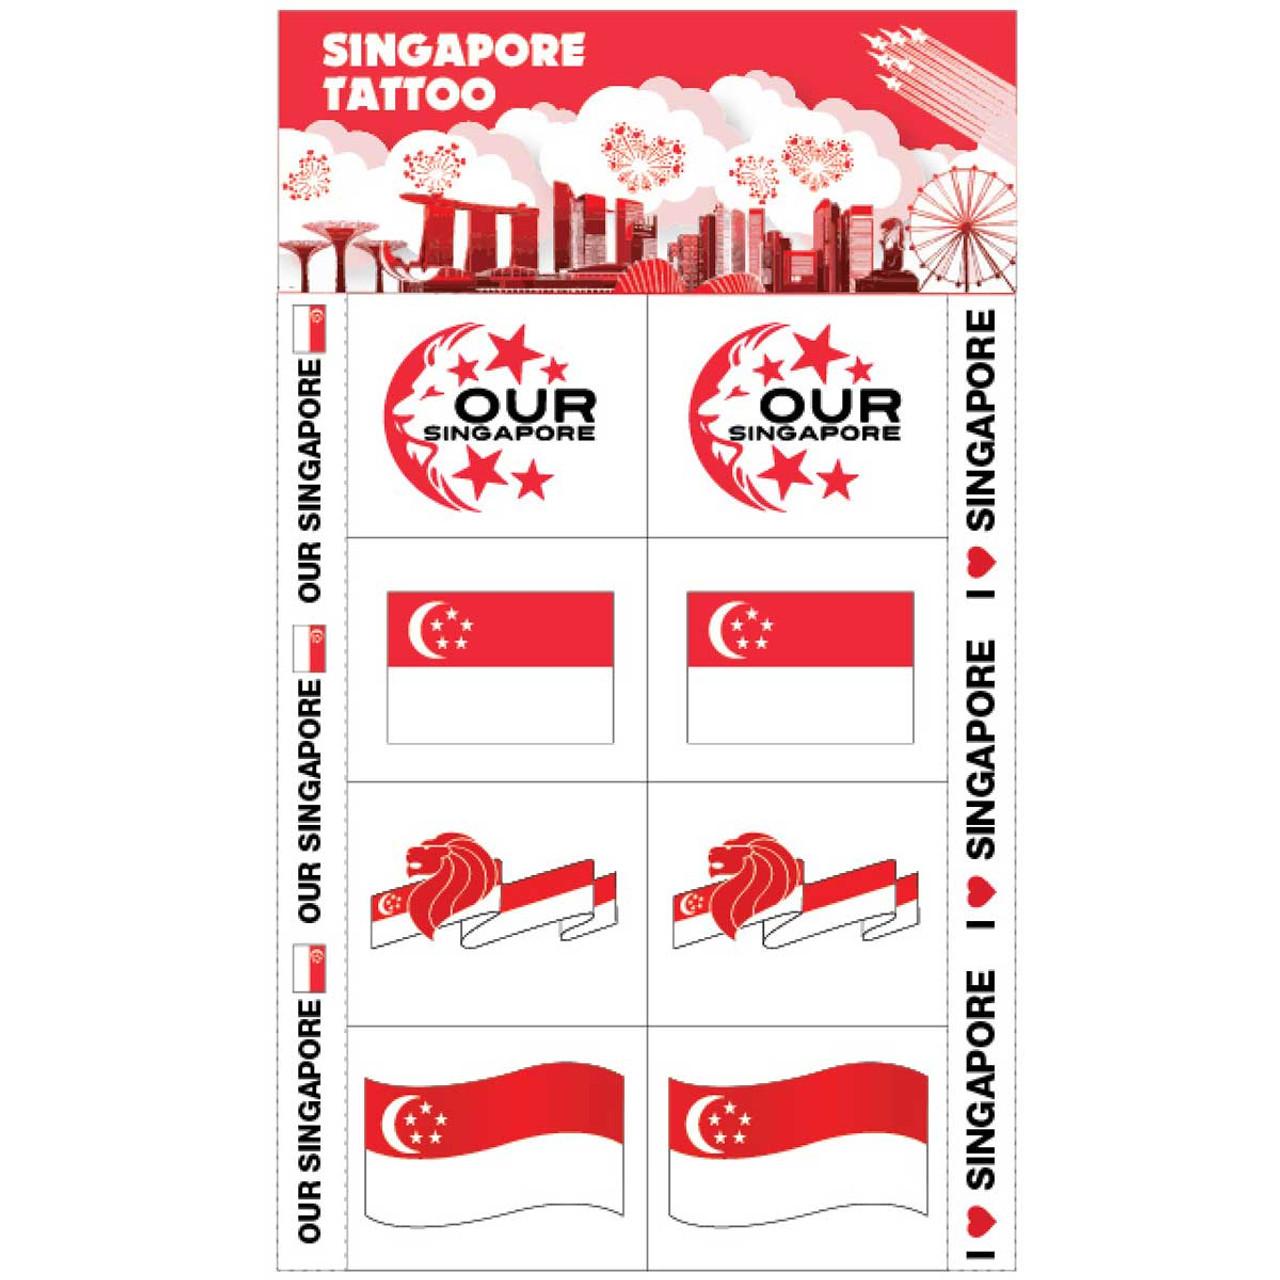 Our Singapore NDP 2019 Flag Tattoo 1 Sheet